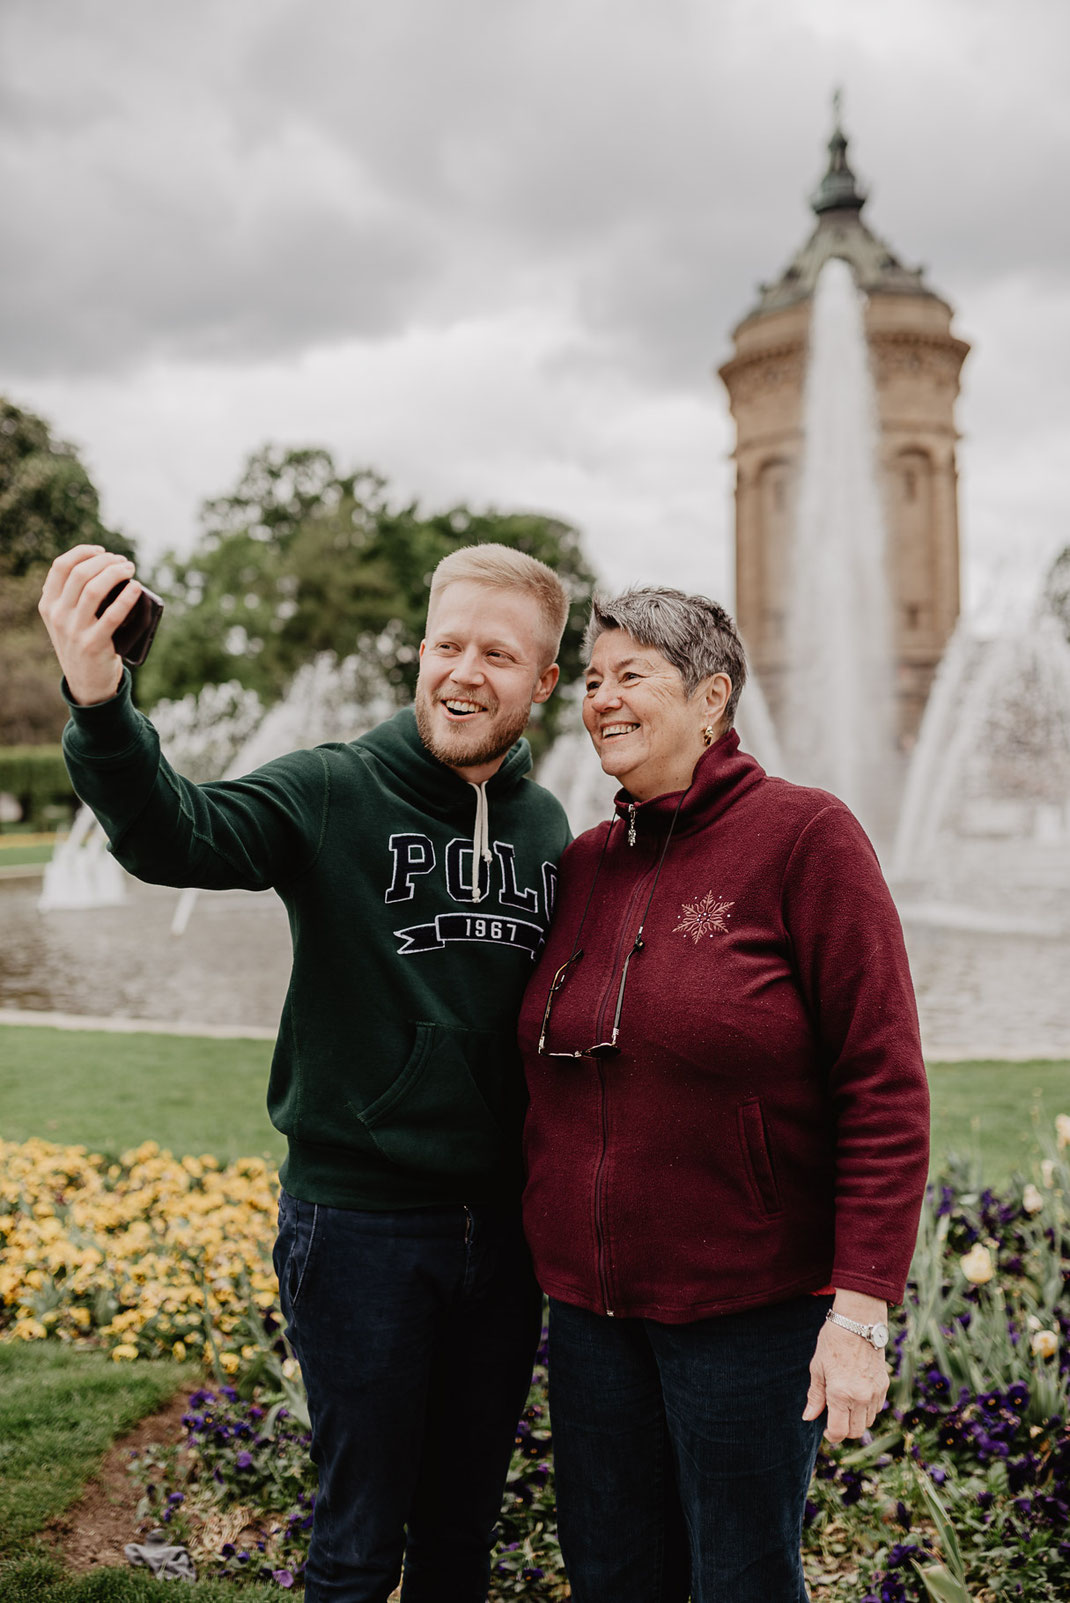 Selfie mit Oma am Wasserturm Mannheim by Sebastian Pintea